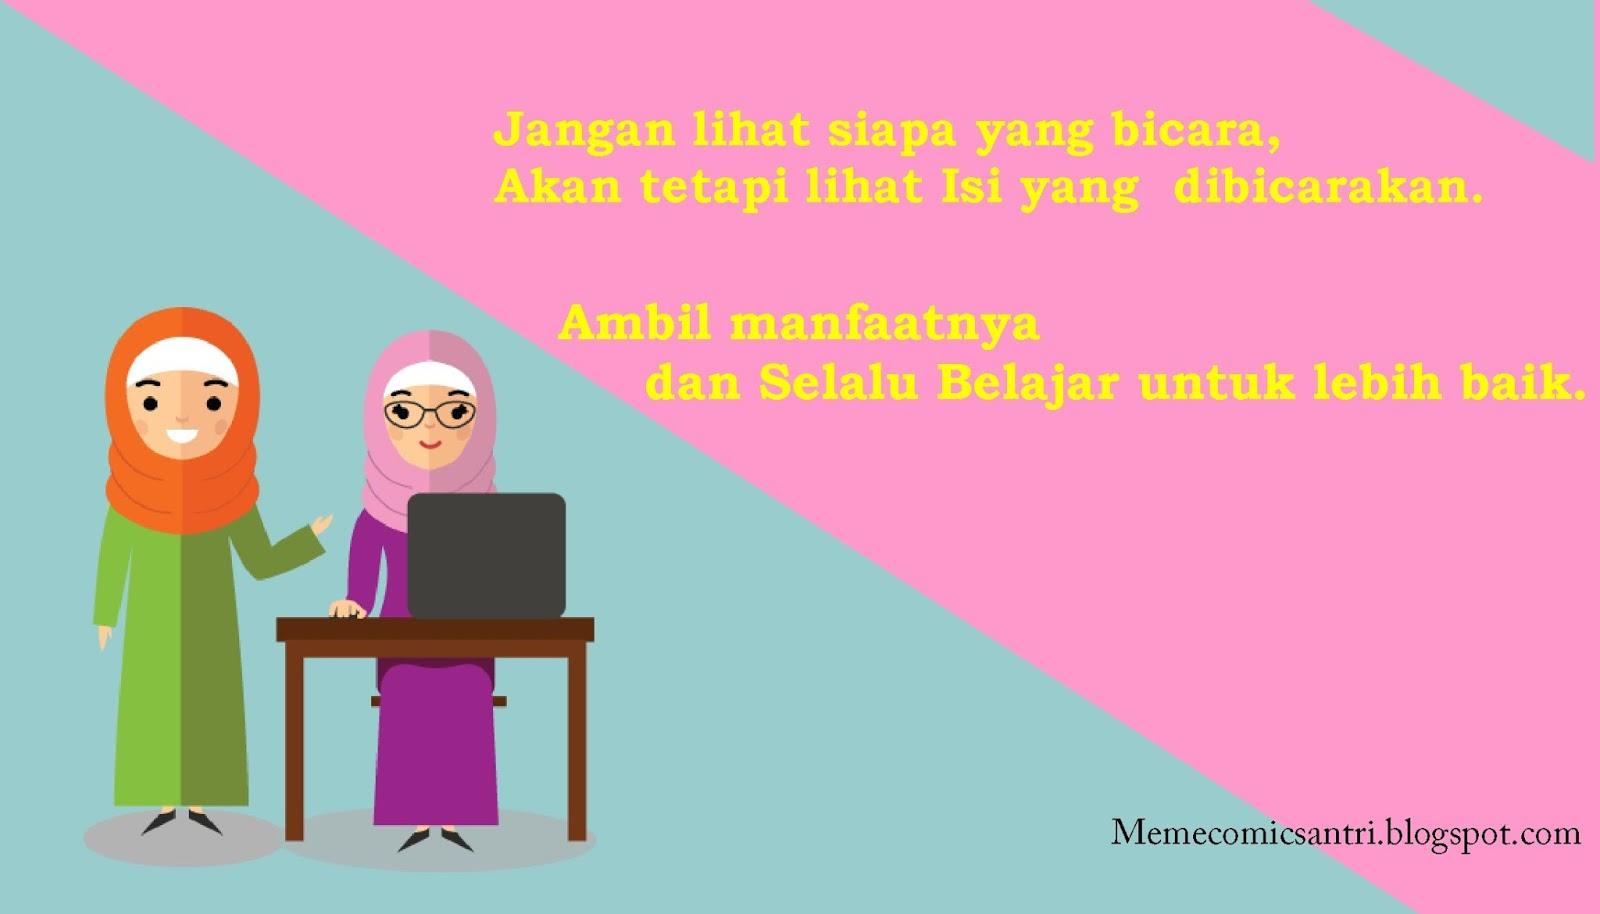 Kumpulan Gambar Kartun Muslimah Dengan Kata Kata Hikmah Kantor Meme